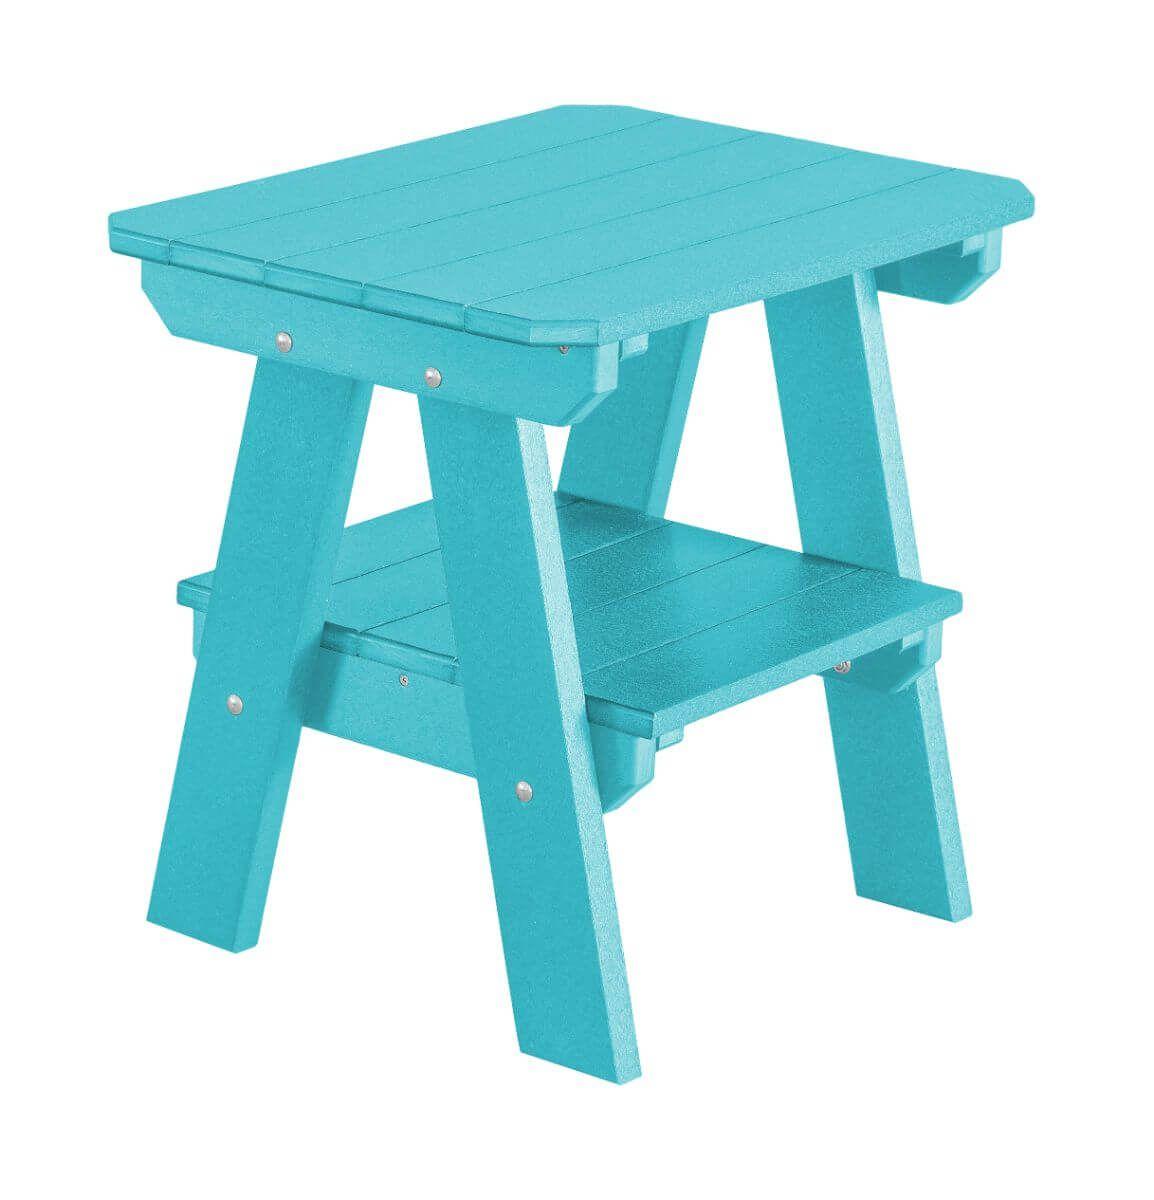 Aruba Blue Sidra Outdoor End Table